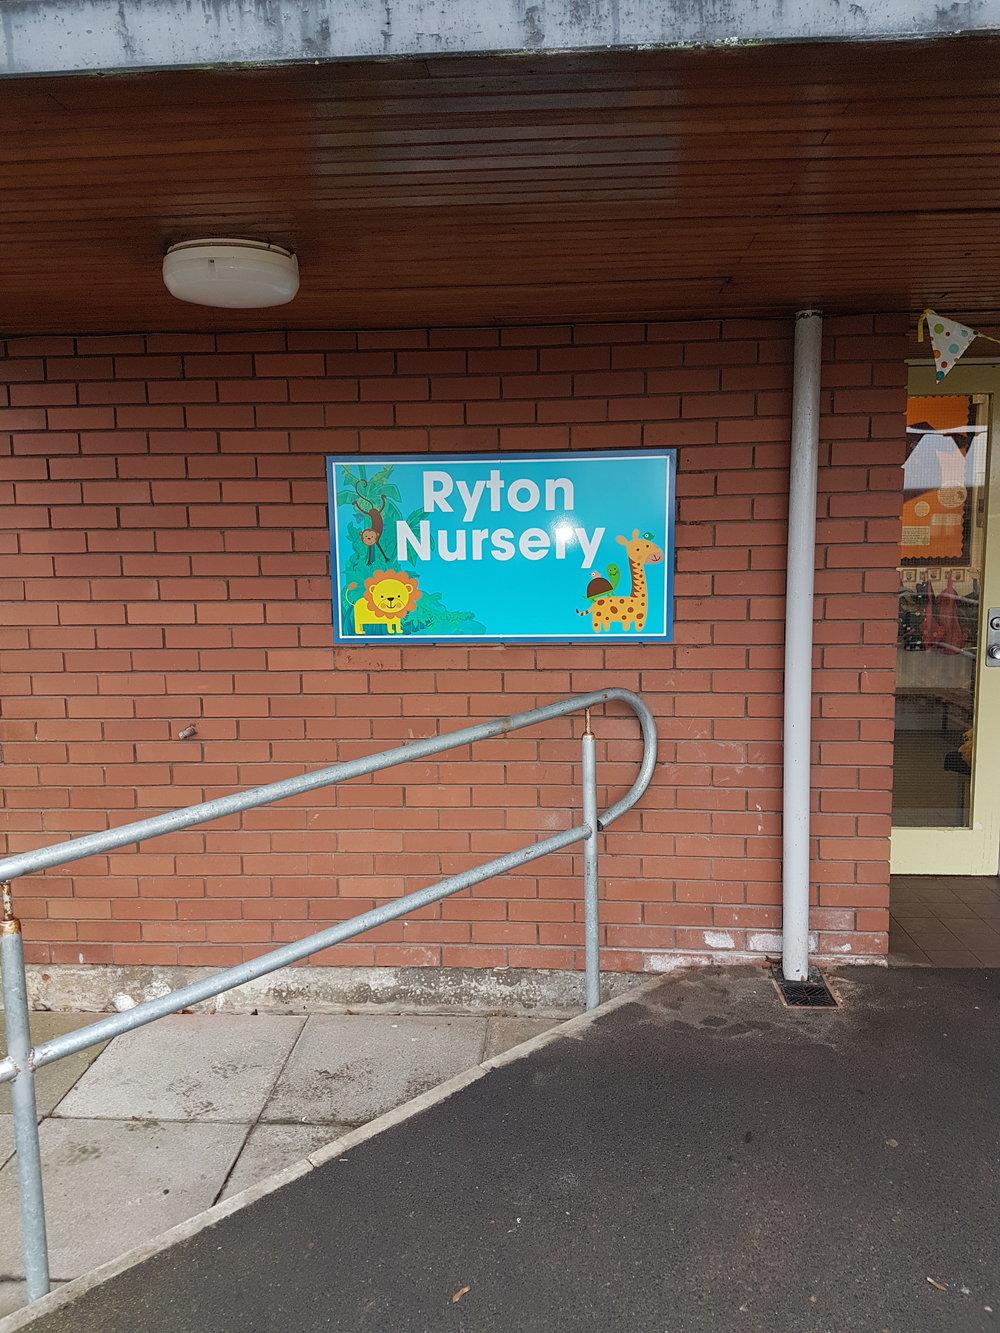 Ryton Nursery Brick Wall Mounted Dibond